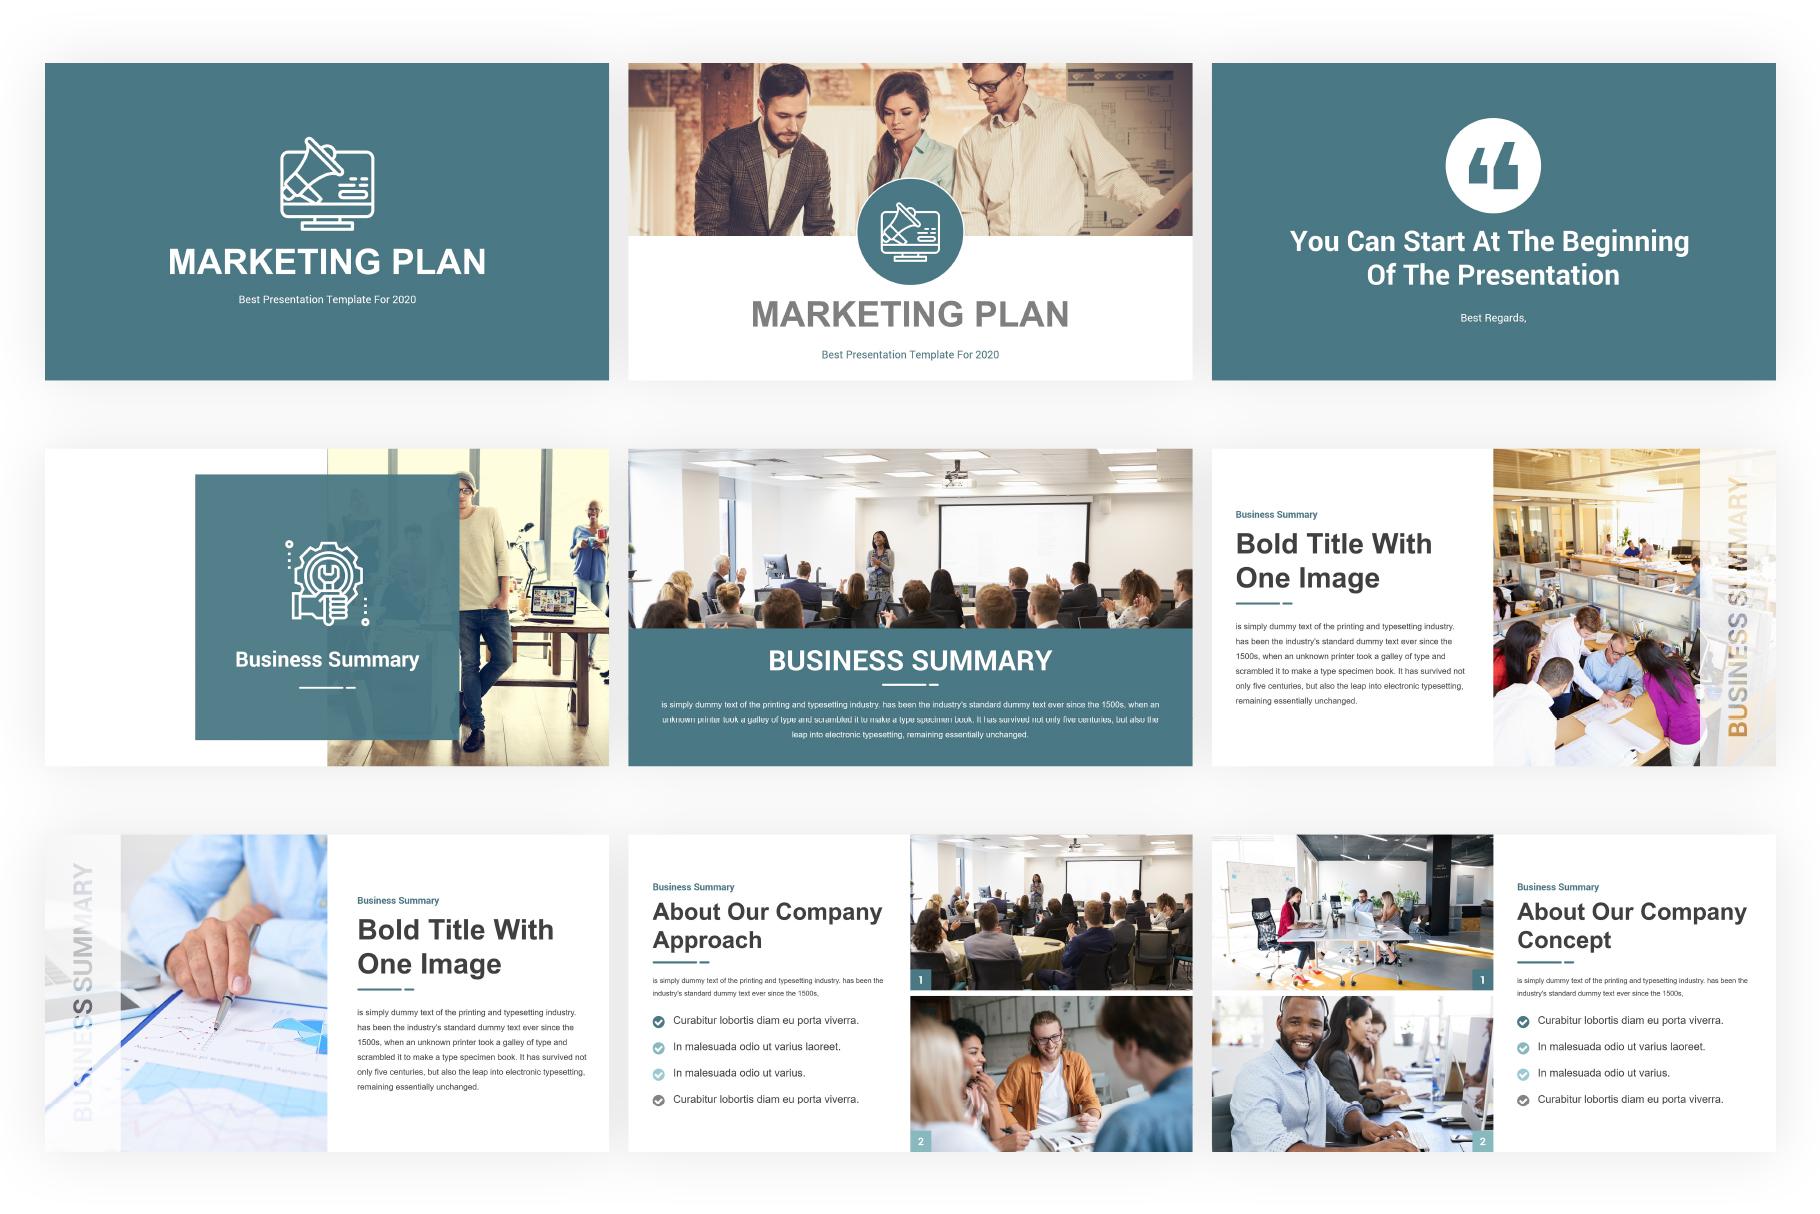 Marketing Plan PowerPoint Presentation Template example image 2